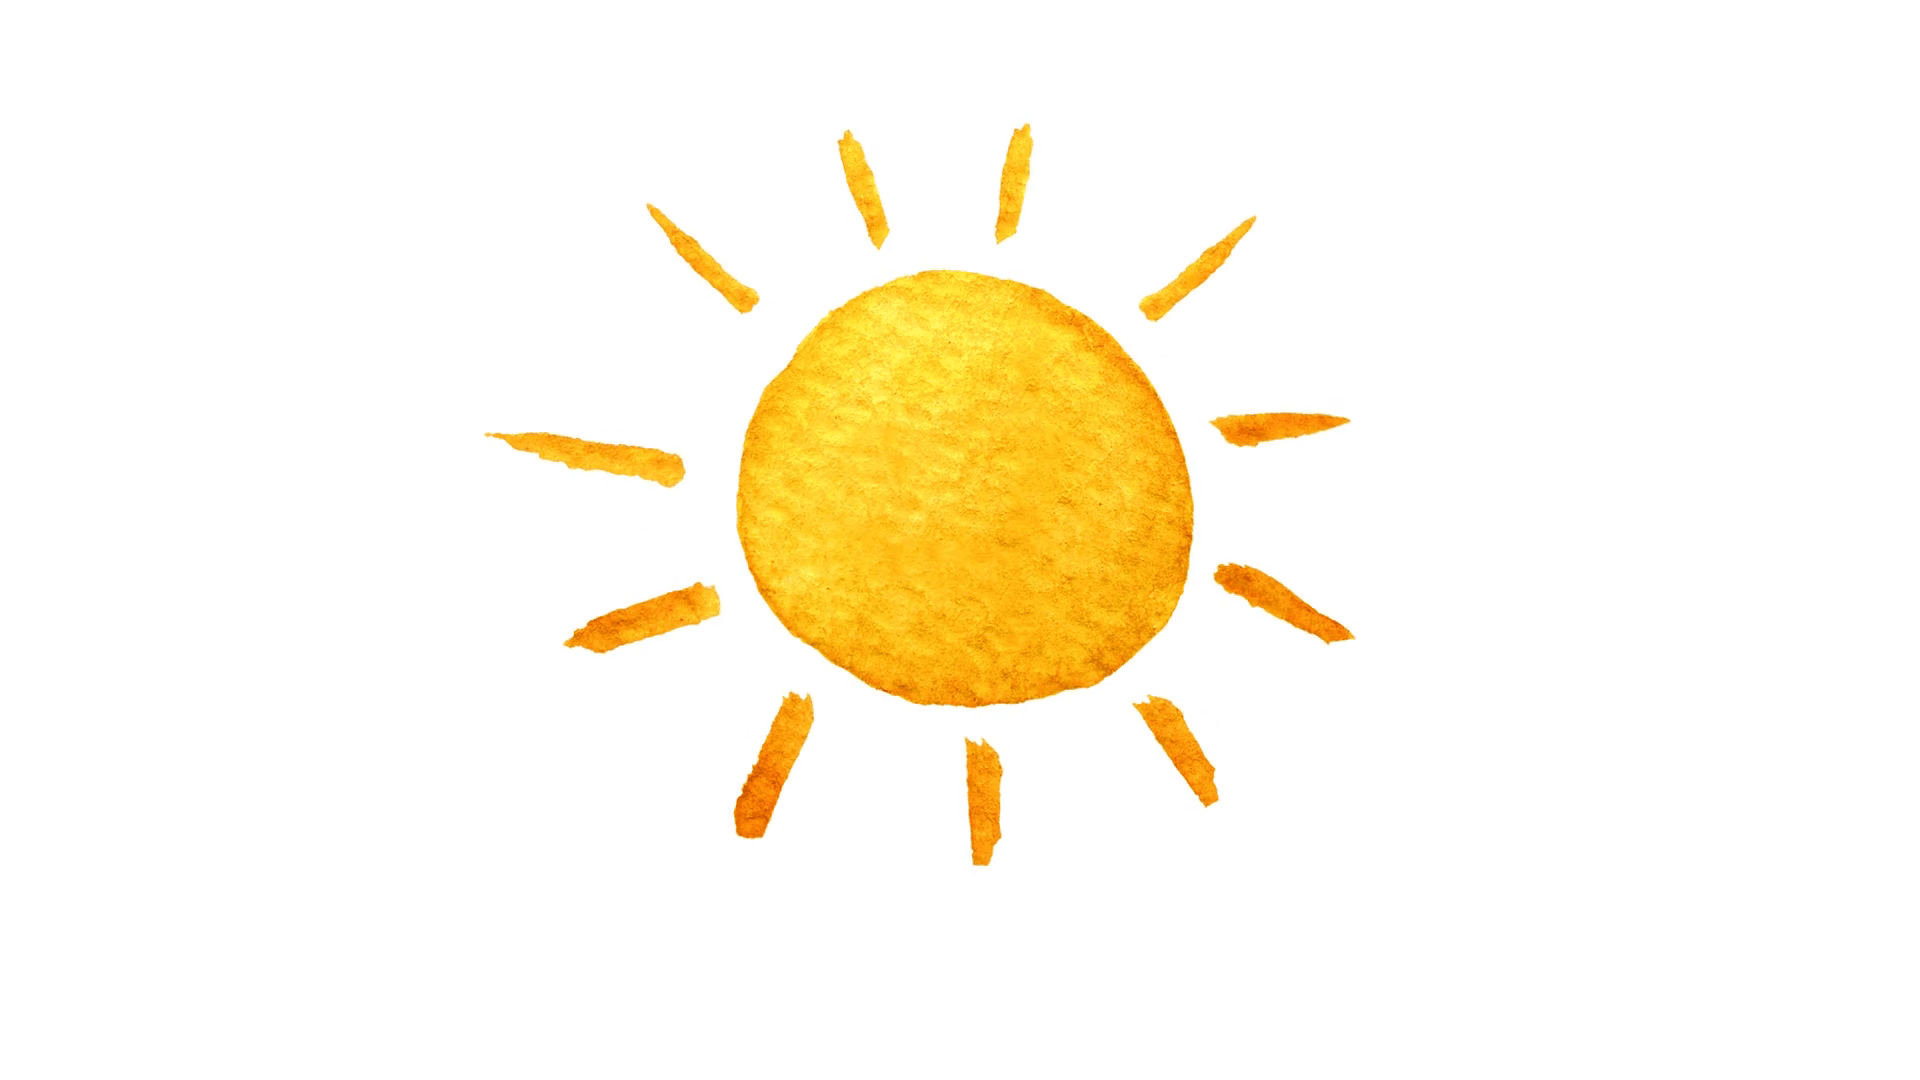 yellow sun - Google Search